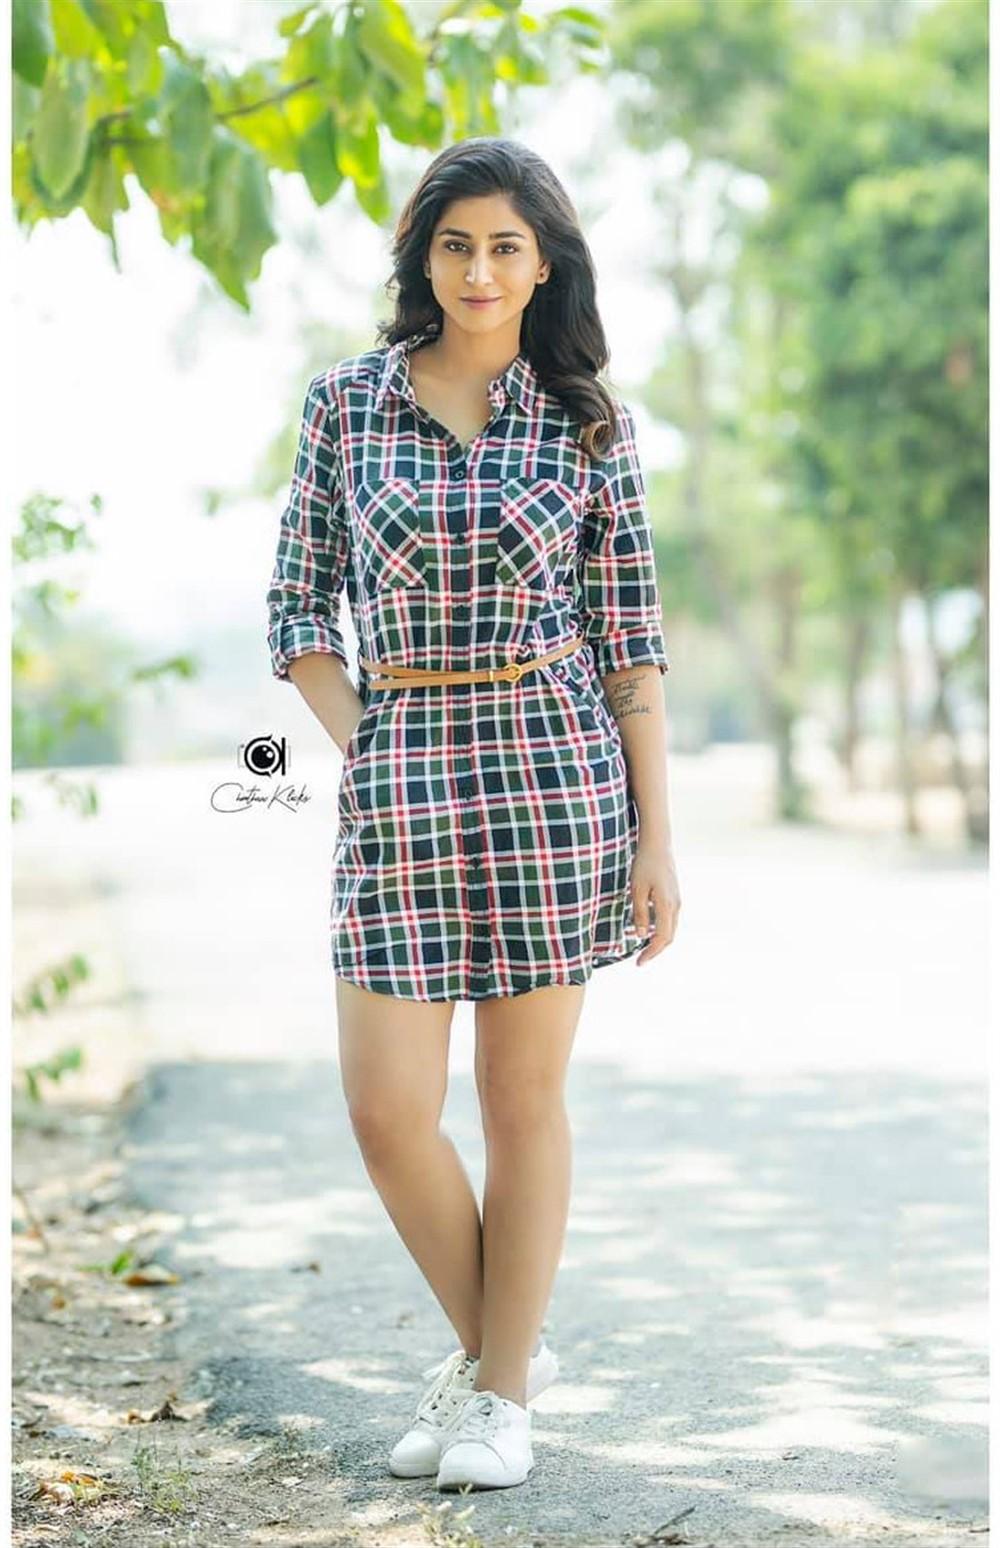 Actress Varshini Sounderajan Photoshoot Pictures